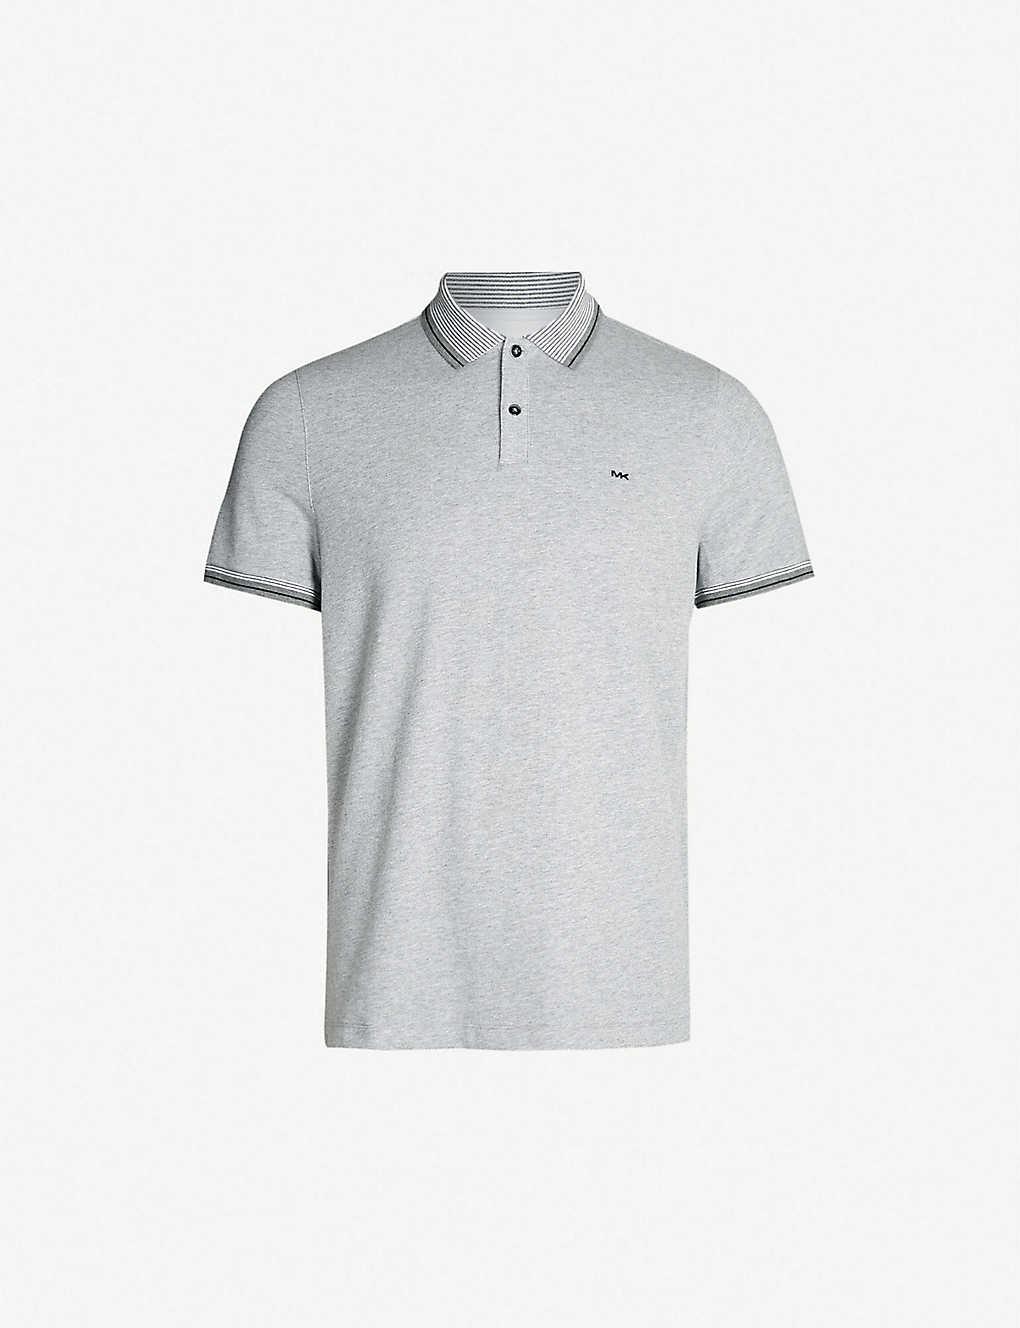 d9447f1f MICHAEL KORS - Striped-trim cotton-jersey polo shirt   Selfridges.com